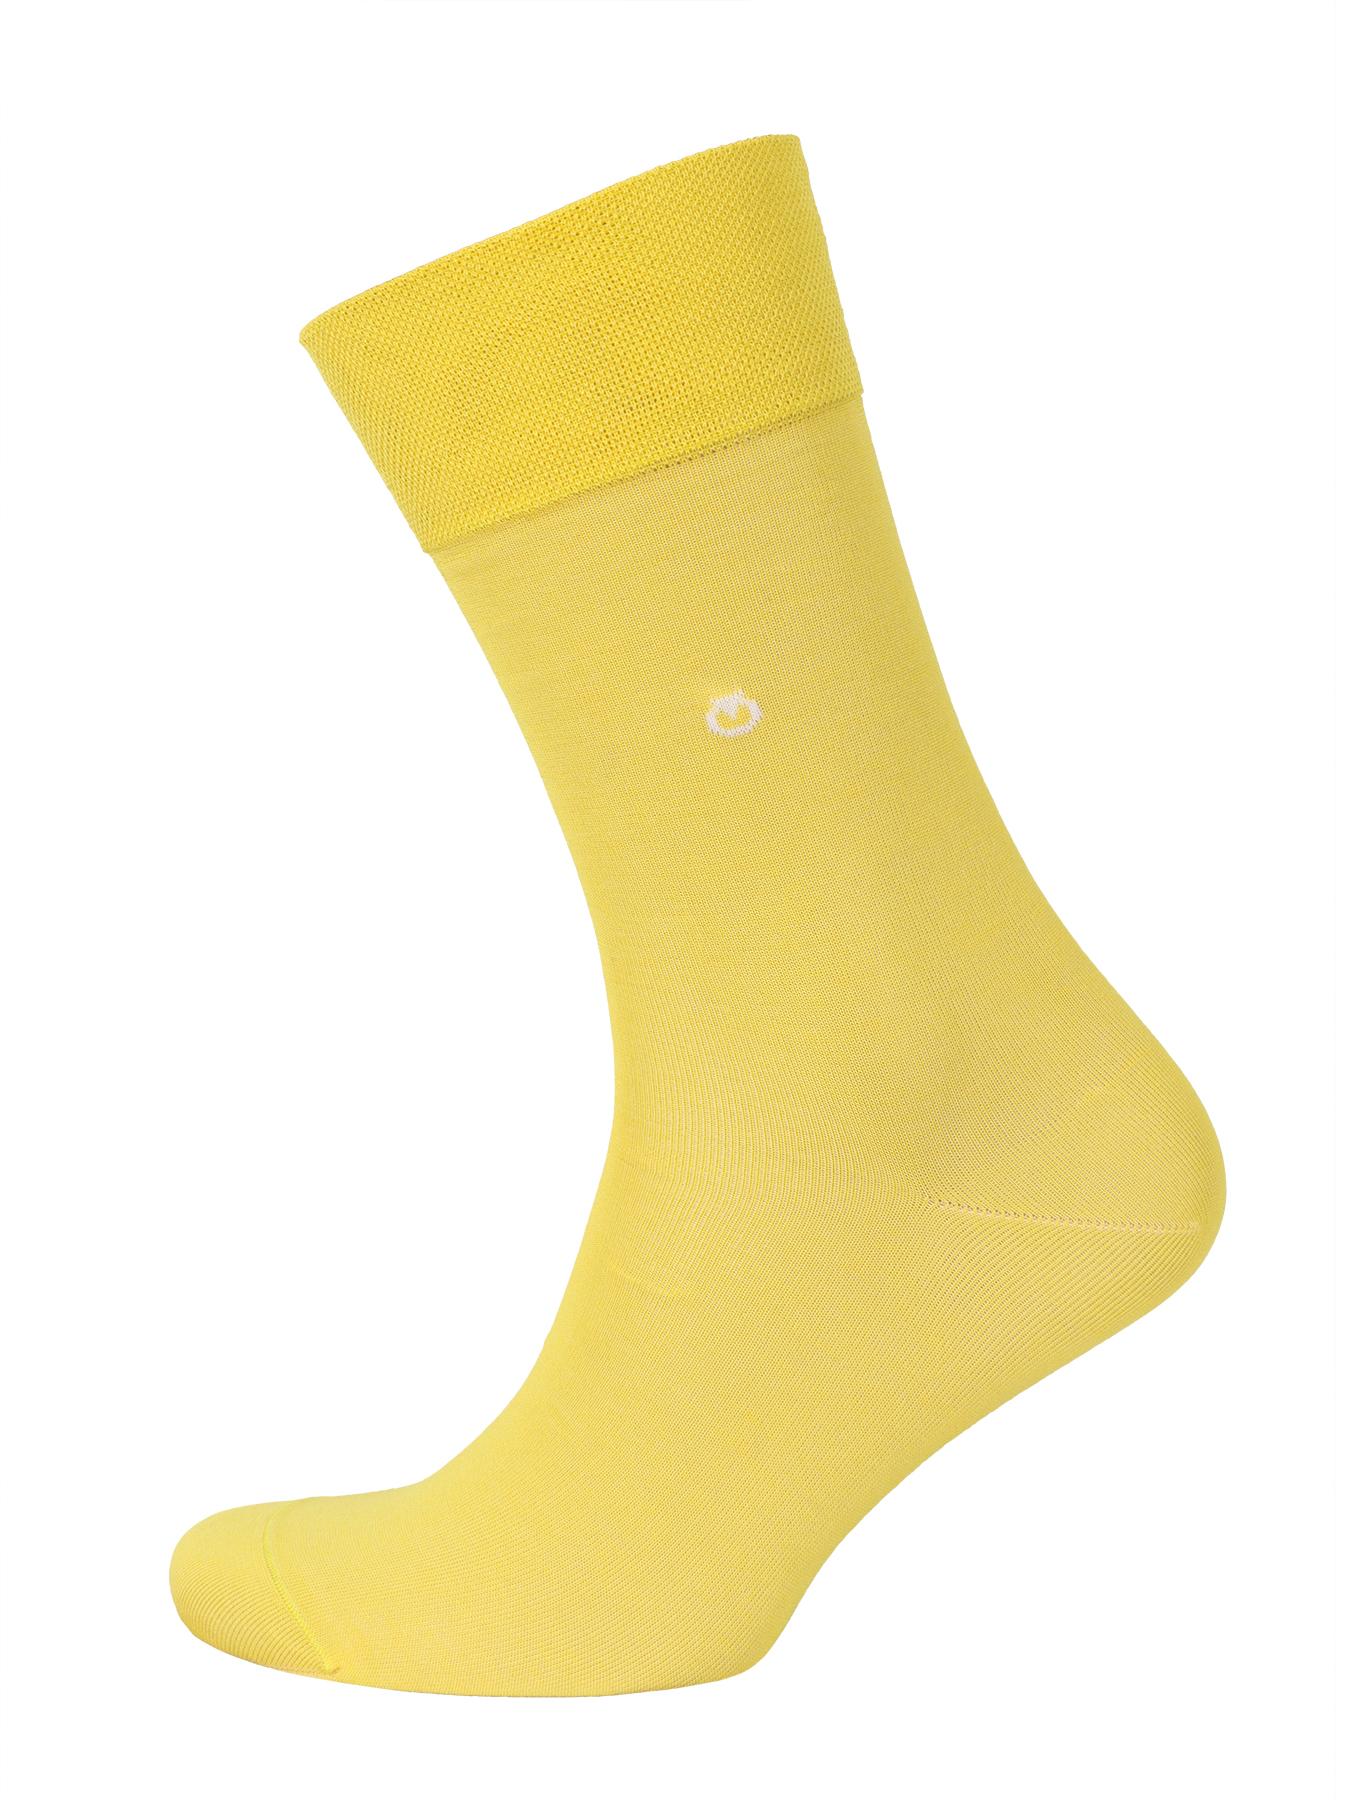 Мужские носки Opium Premium желтый